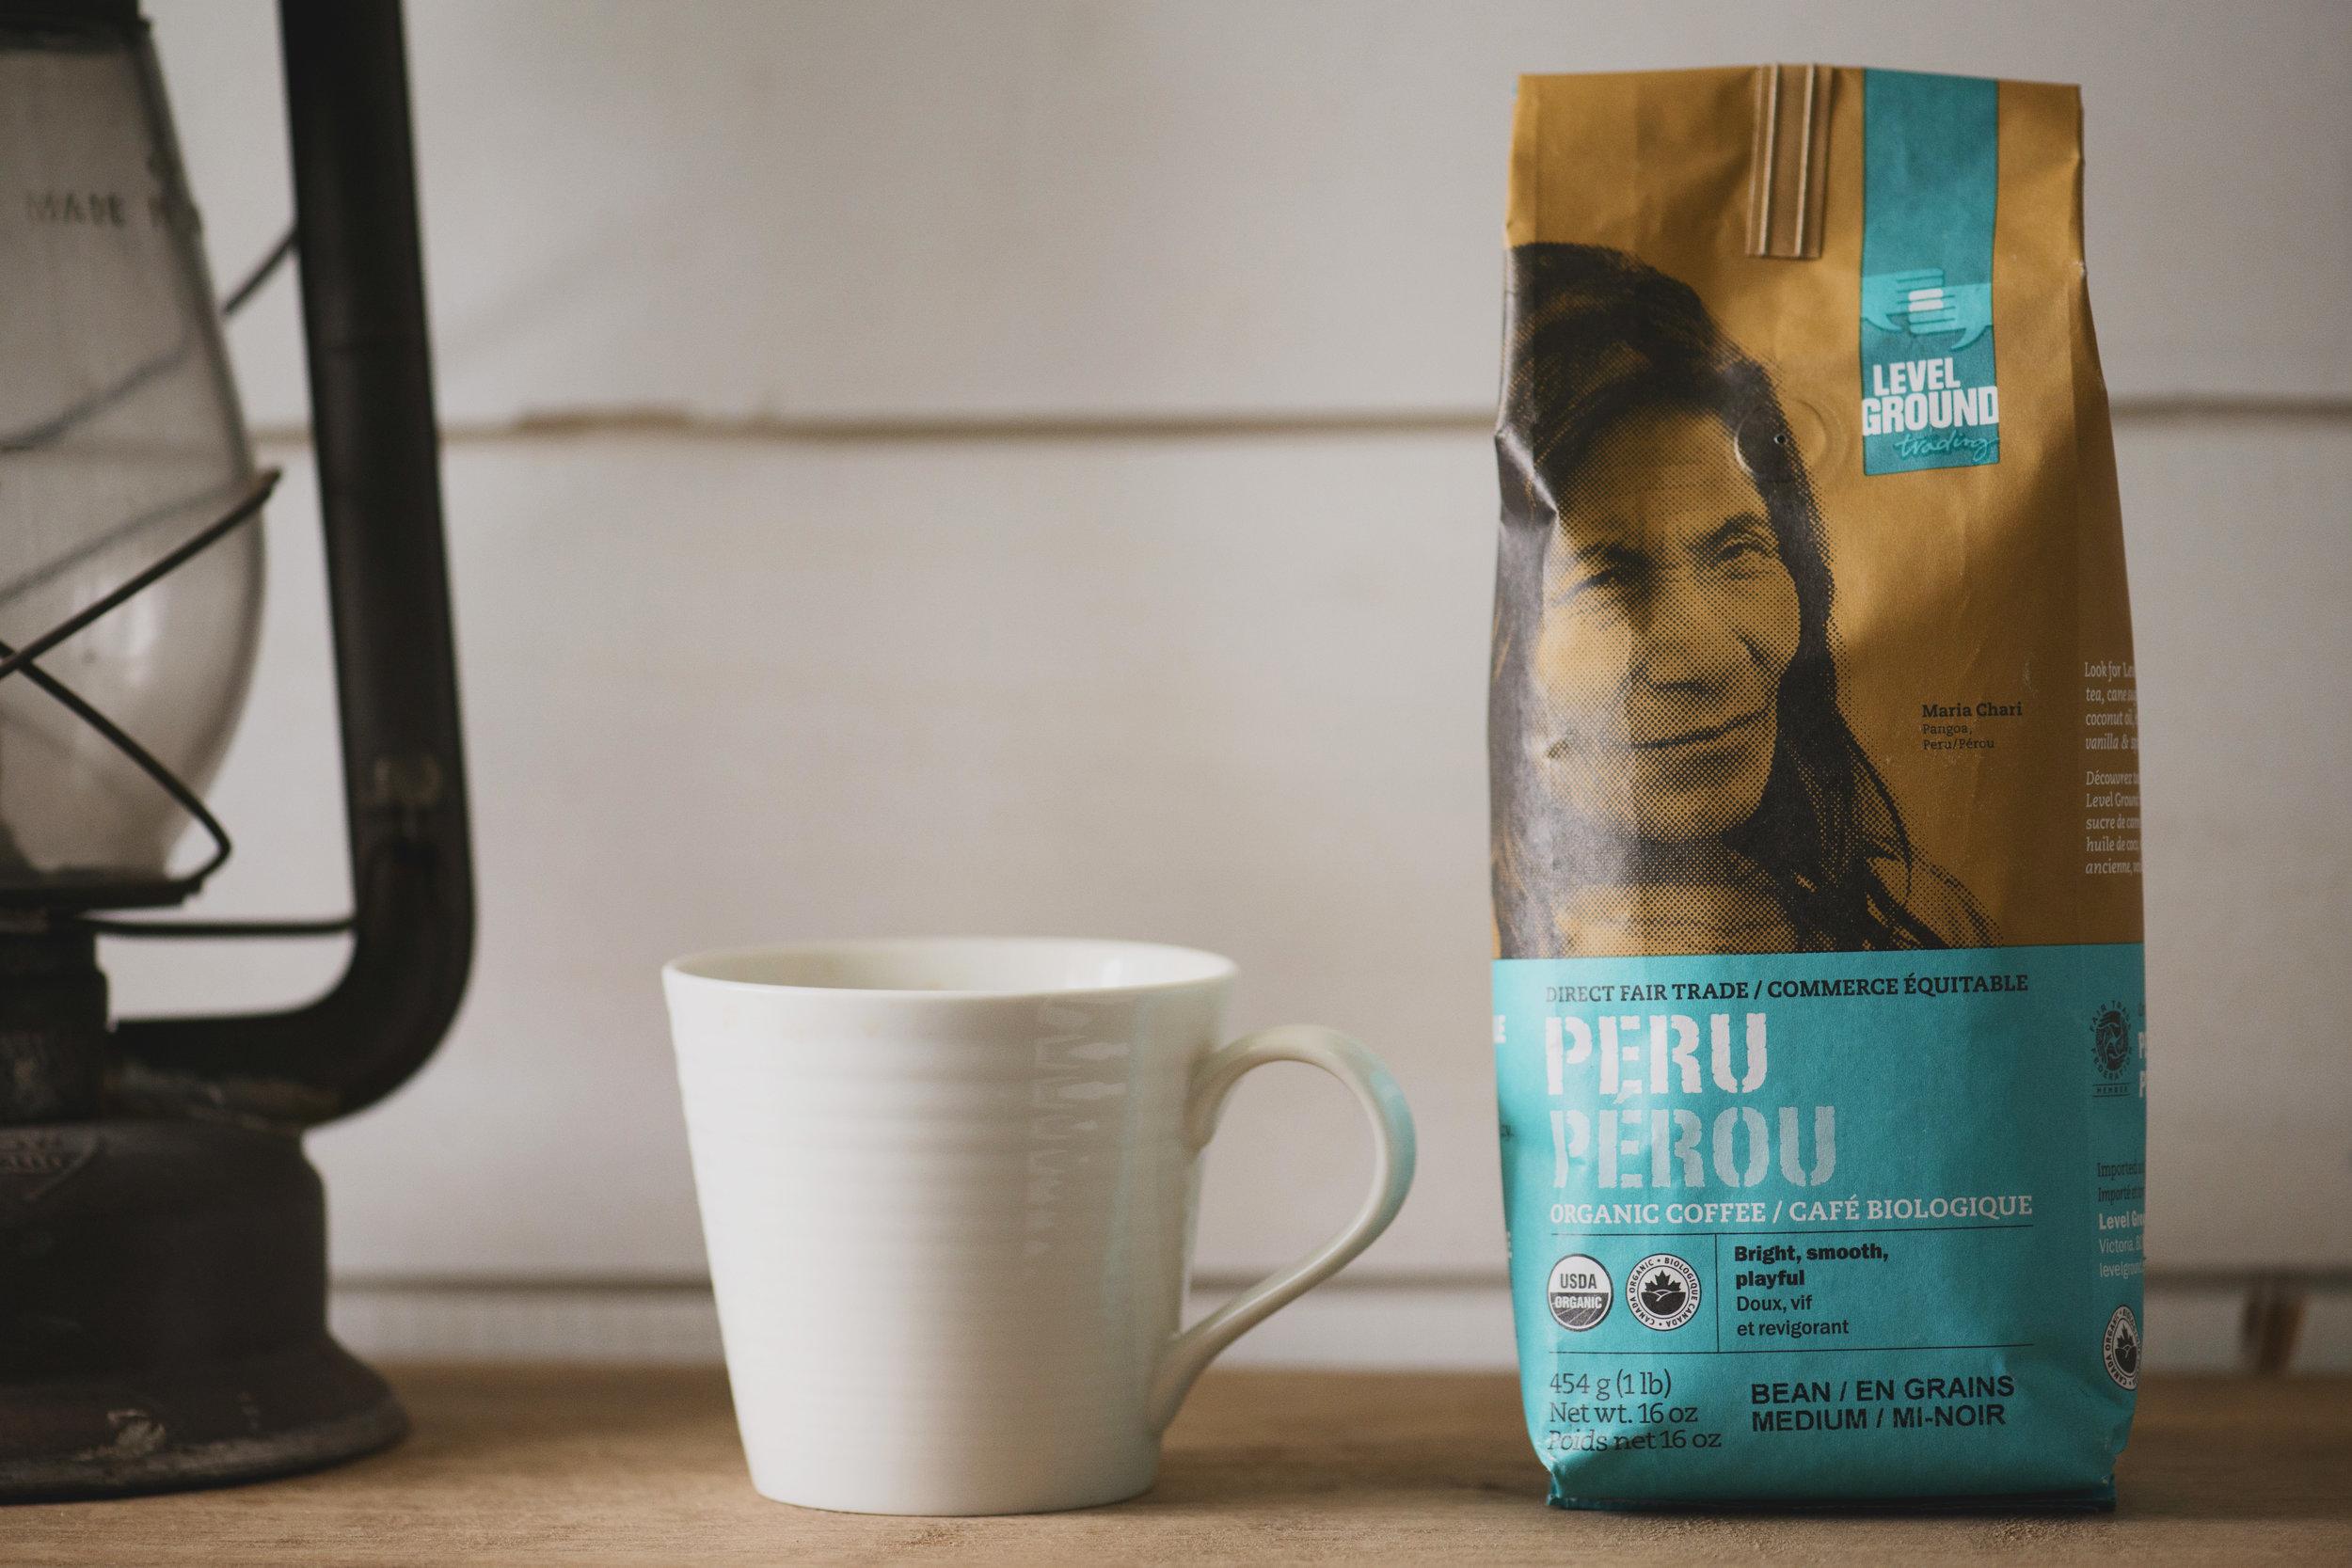 French Press Peru coffee